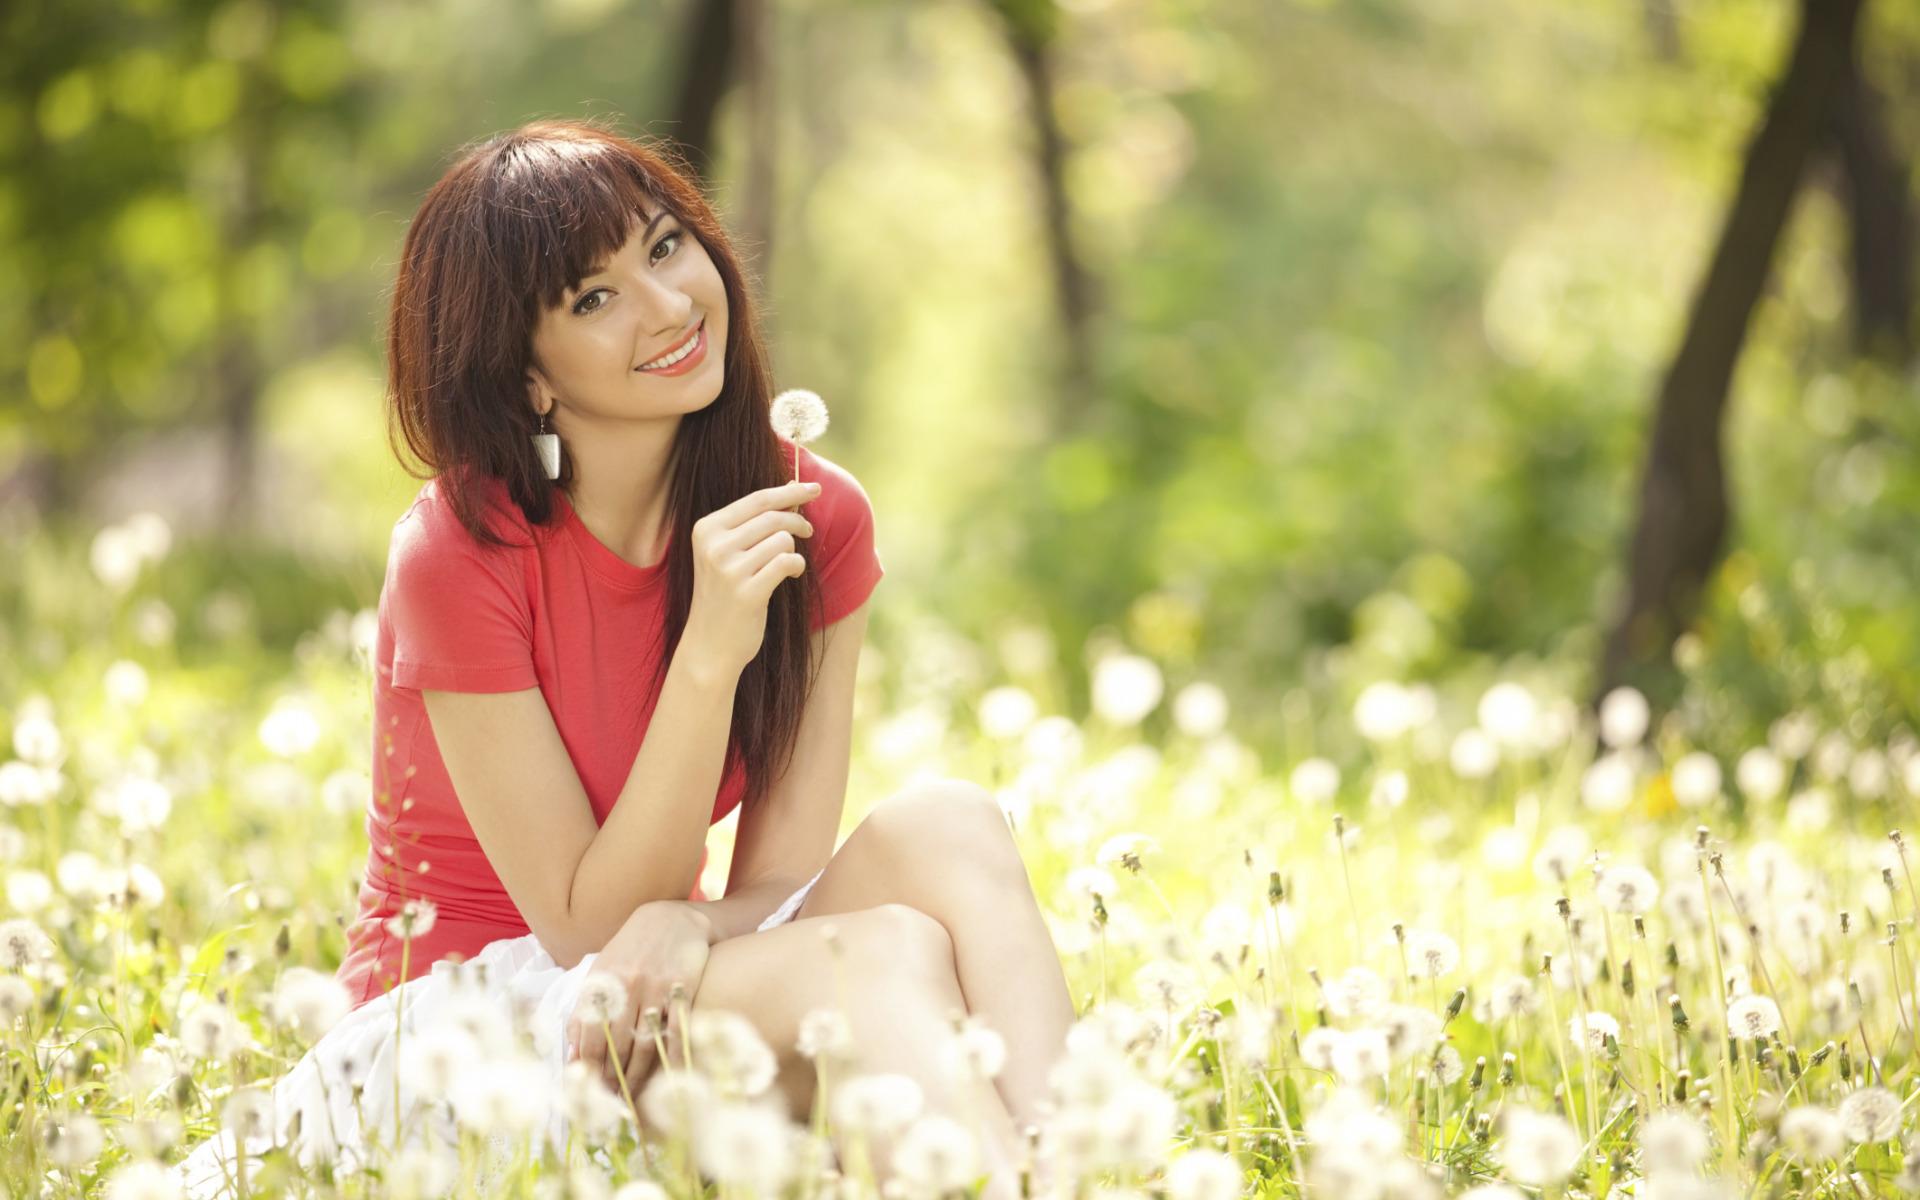 Картинки счастливой девушки брюнетки, признание любви любимому